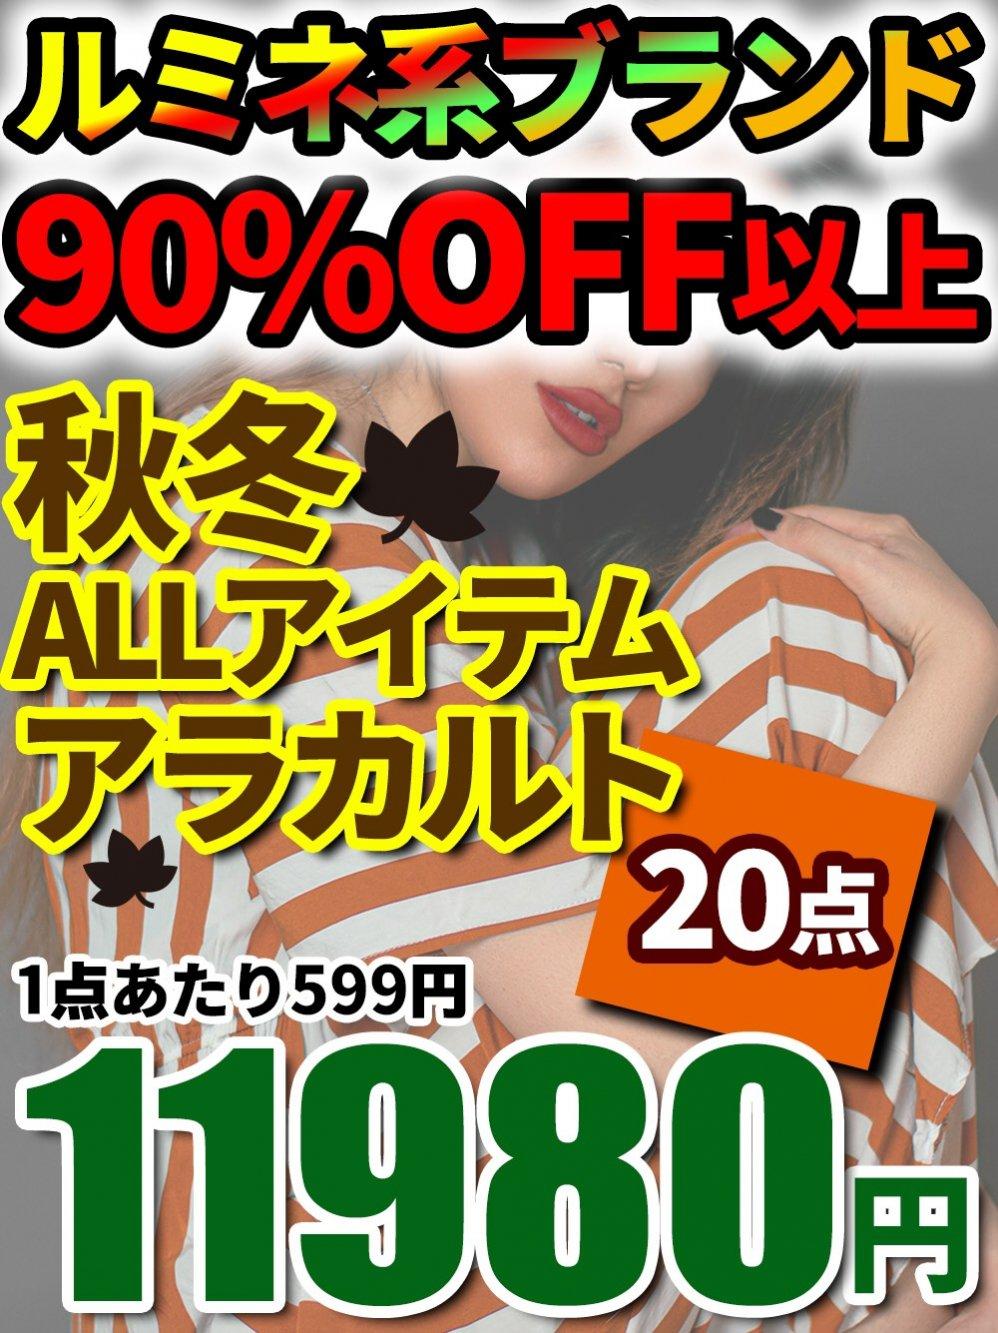 90%OFF以上!【ルミネ系ブランド】秋冬オールアイテムアラカルト@599【20点】